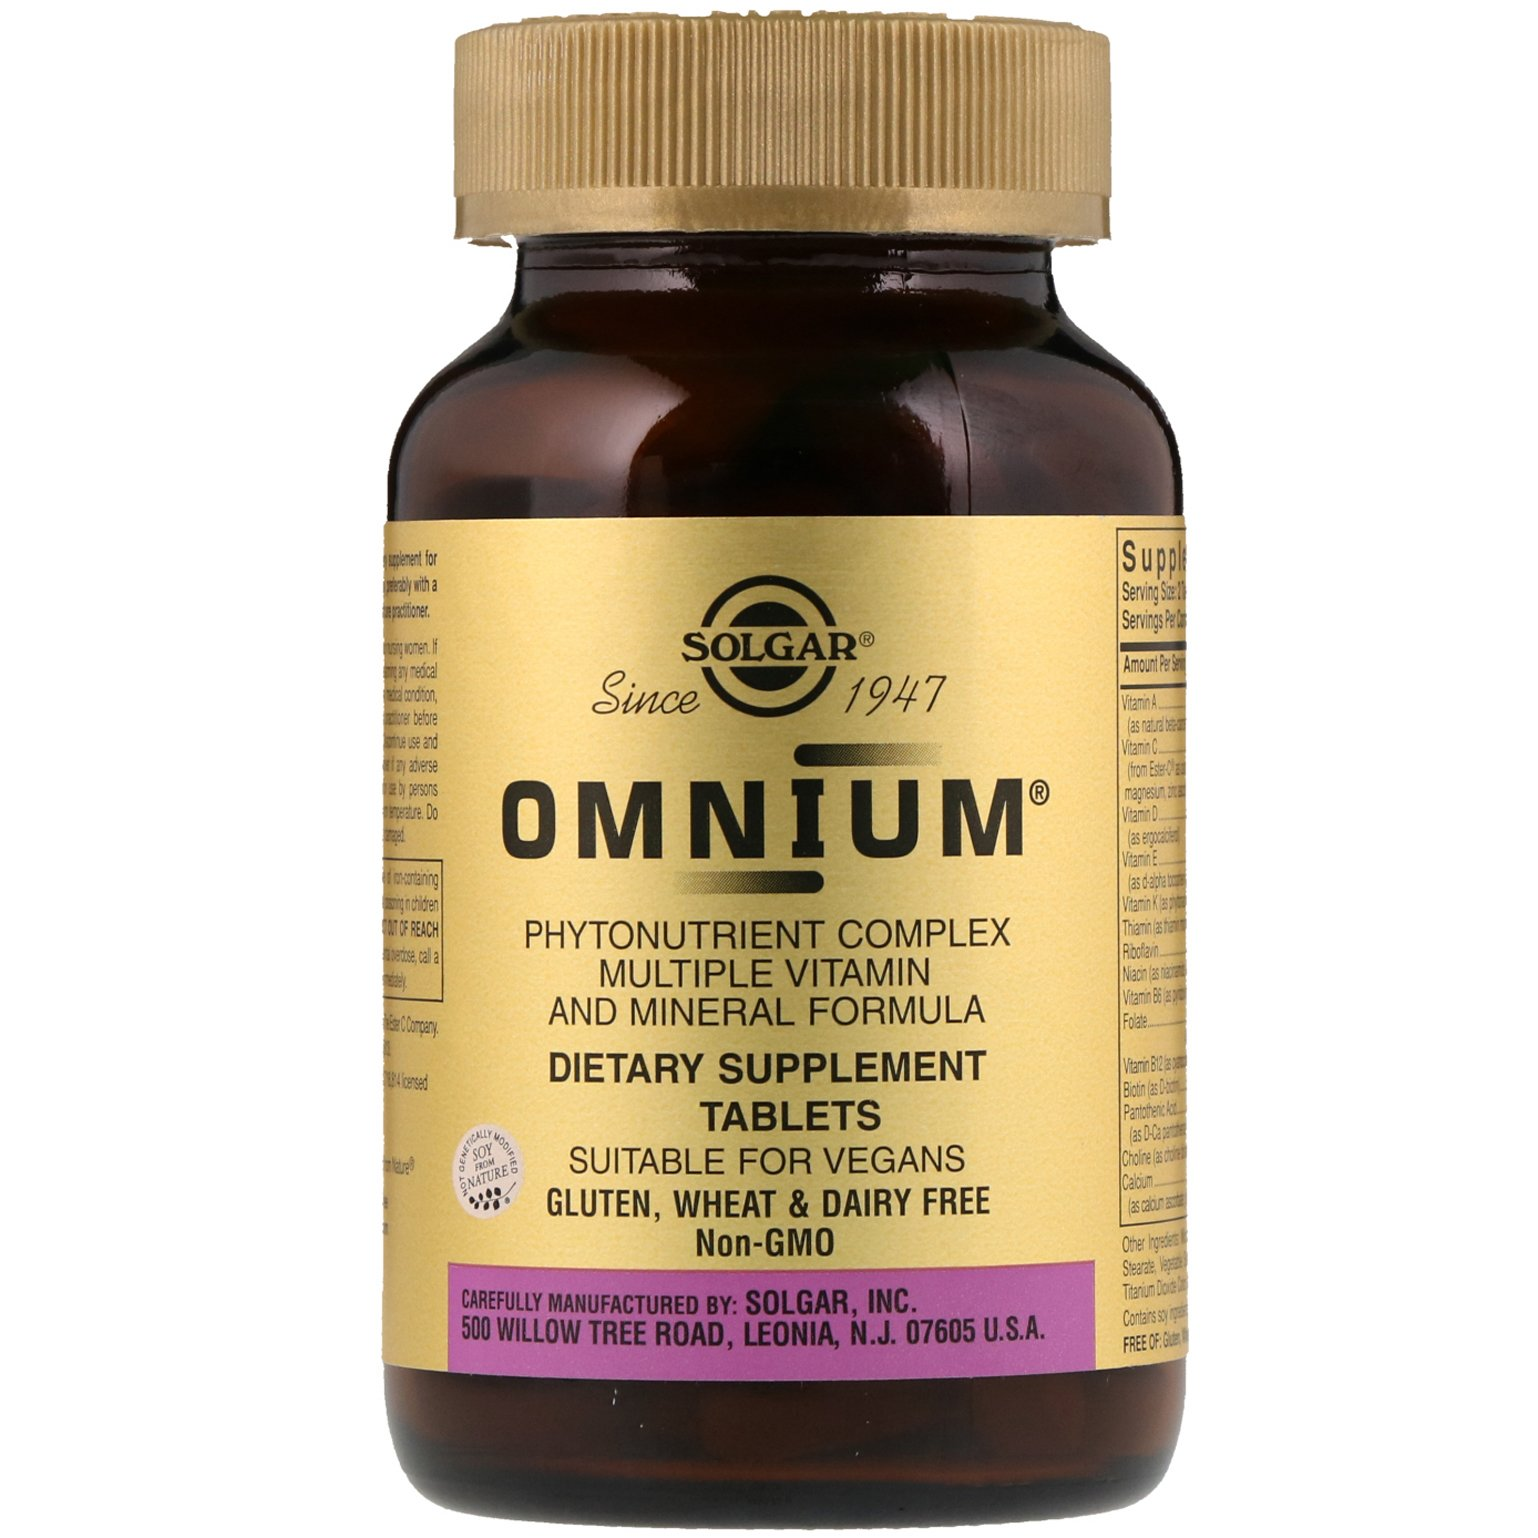 Solgar Omnium Πρωτοποριακή Προηγμένη Φόρμουλα Πολλαπλής Διατροφικής Αξίας – 60 tabs